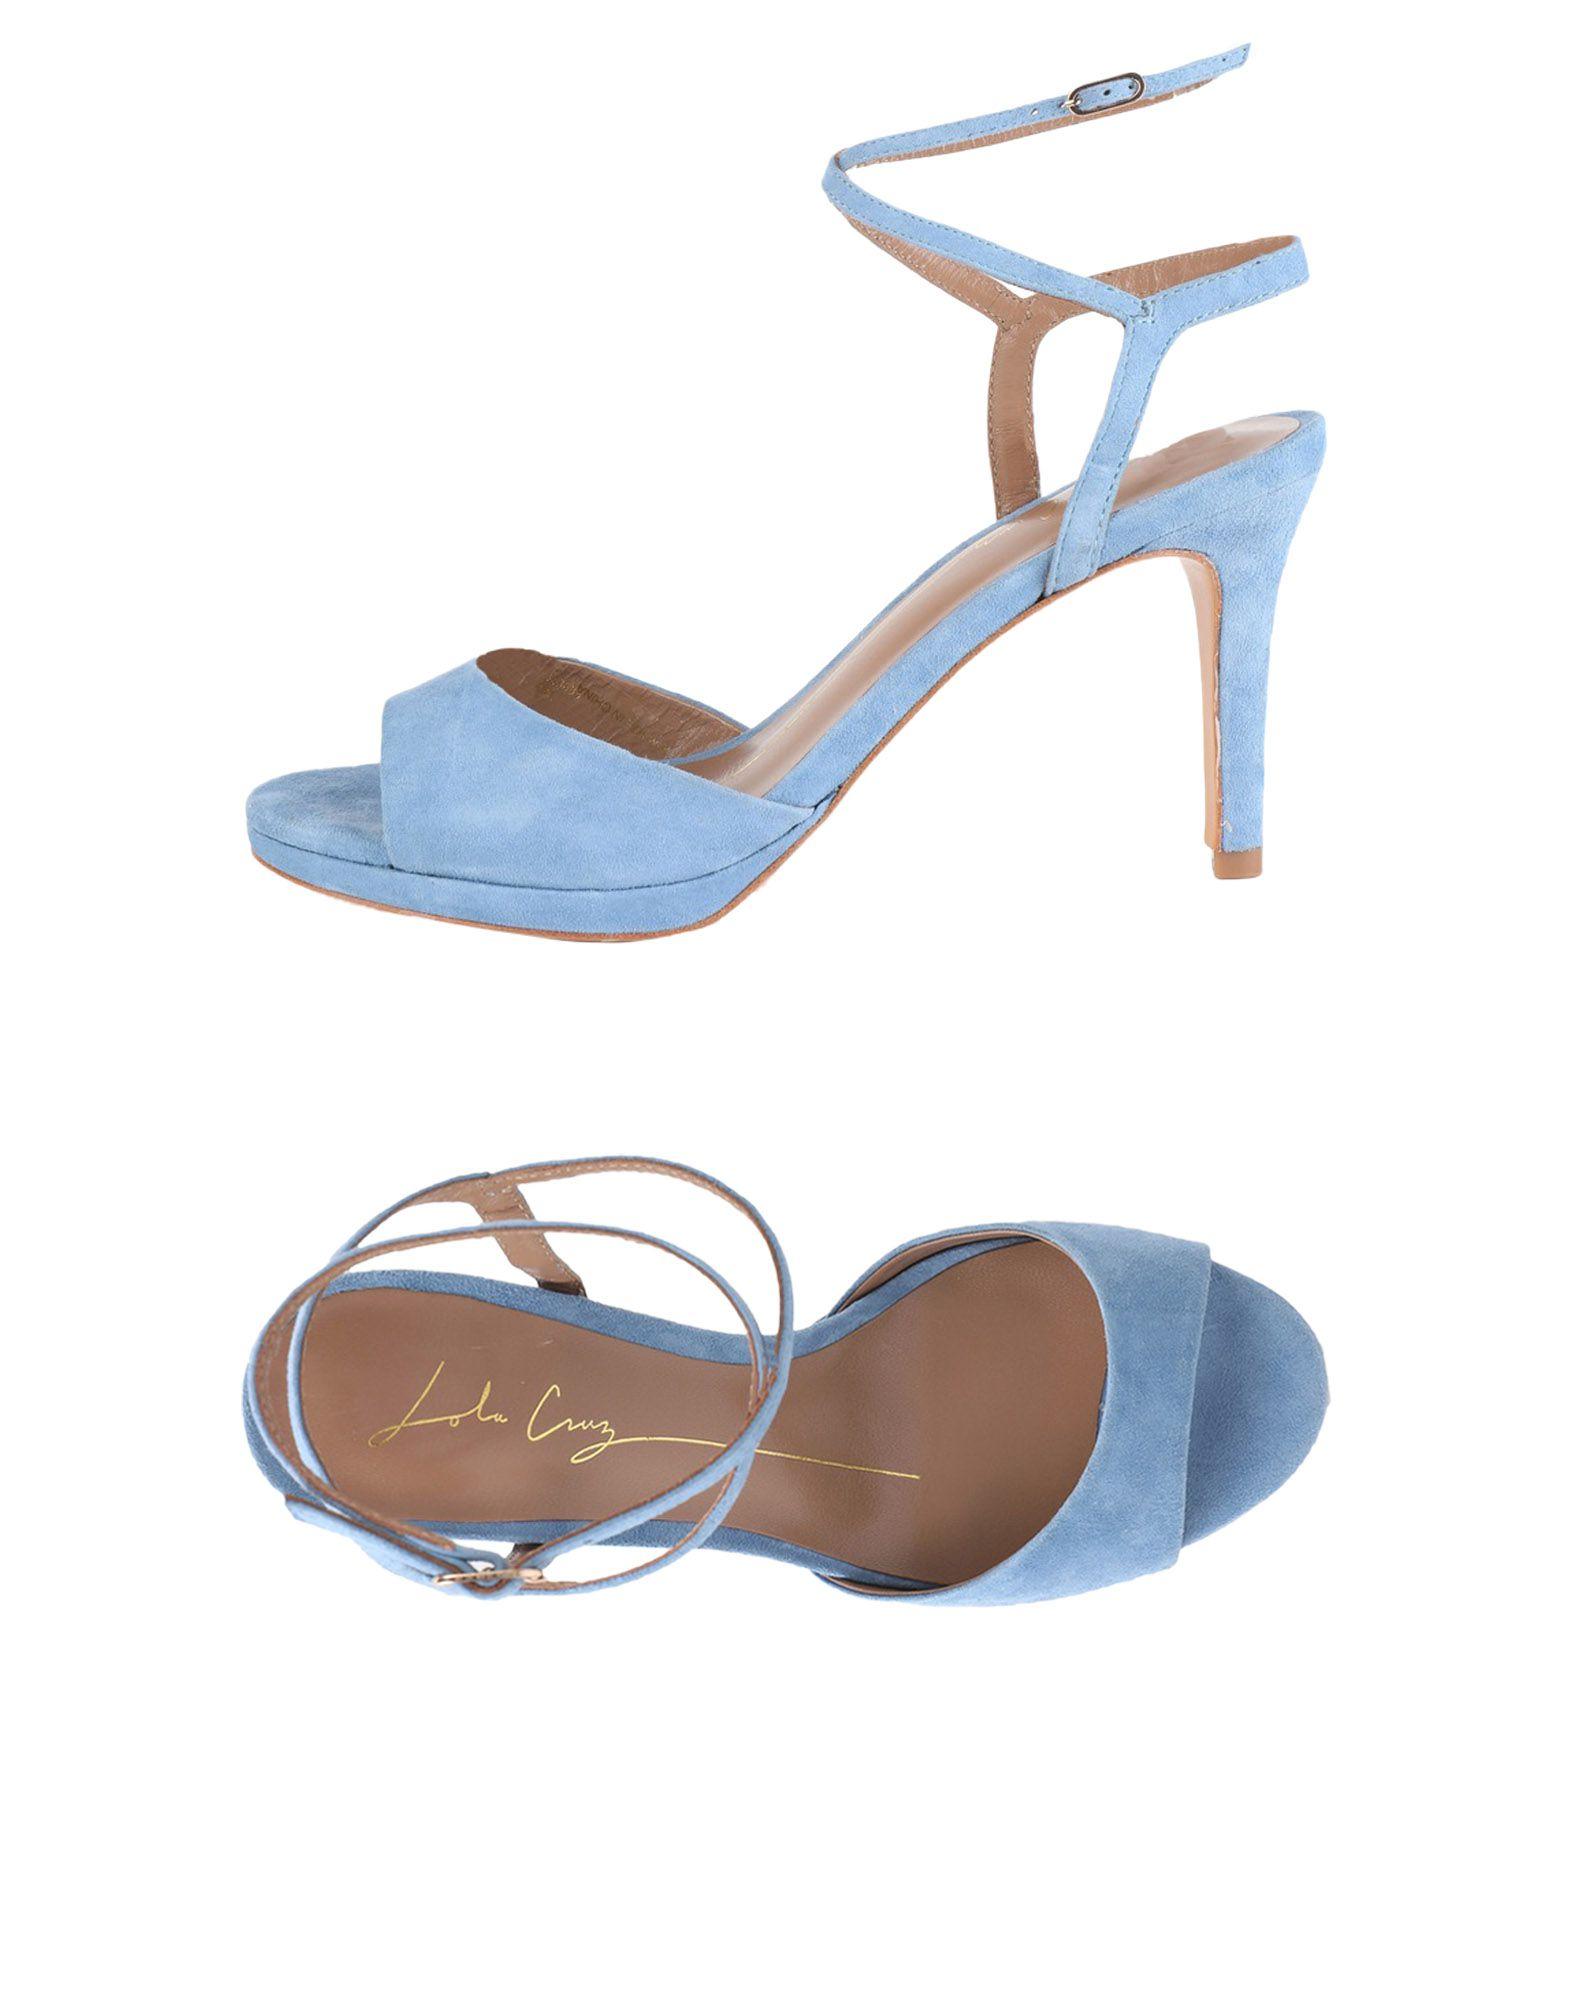 Stilvolle billige Schuhe Lola Cruz Sandalen Damen  11348394OG